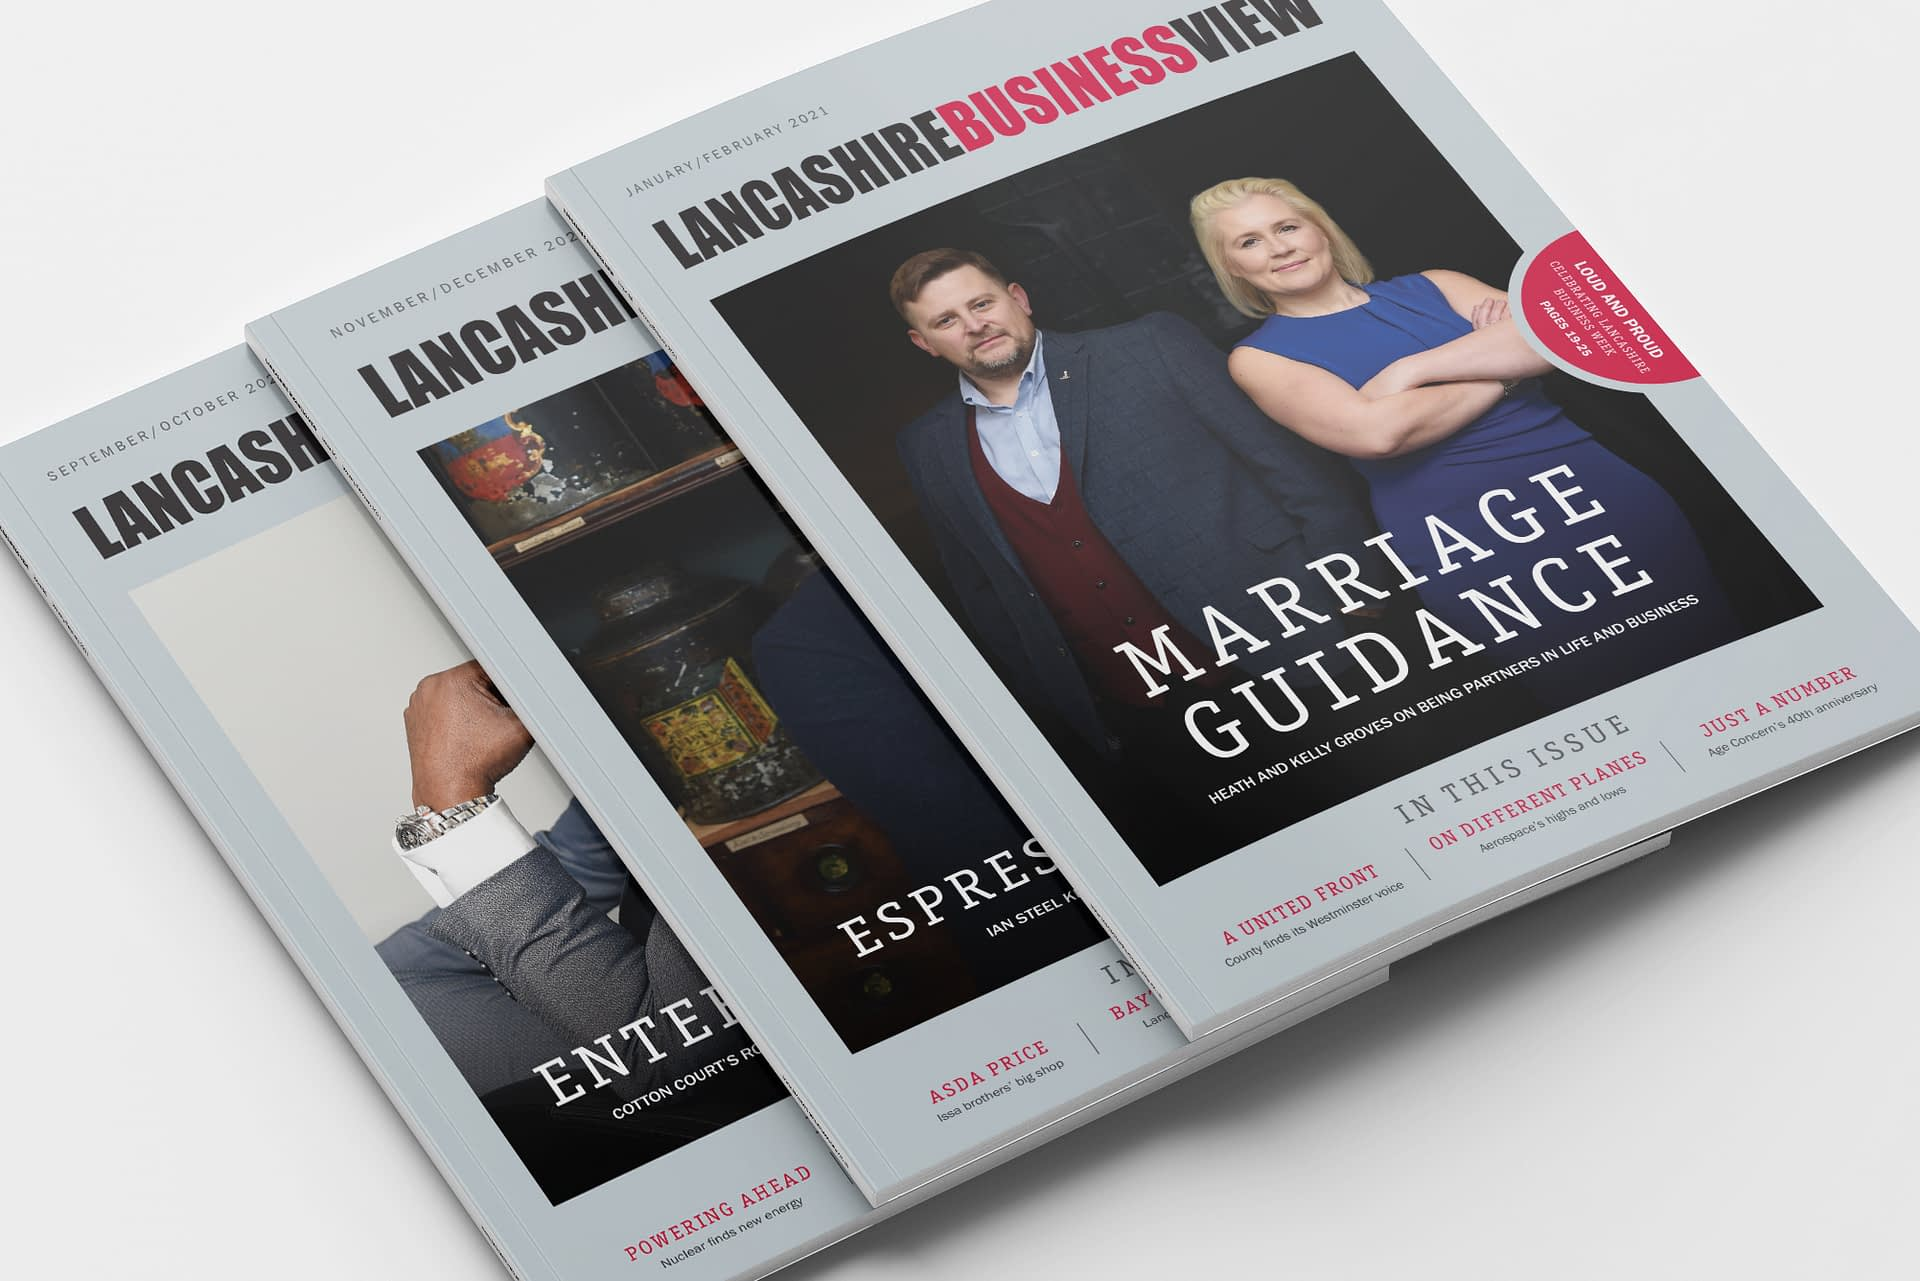 Lancashire Business View Magazine Covers